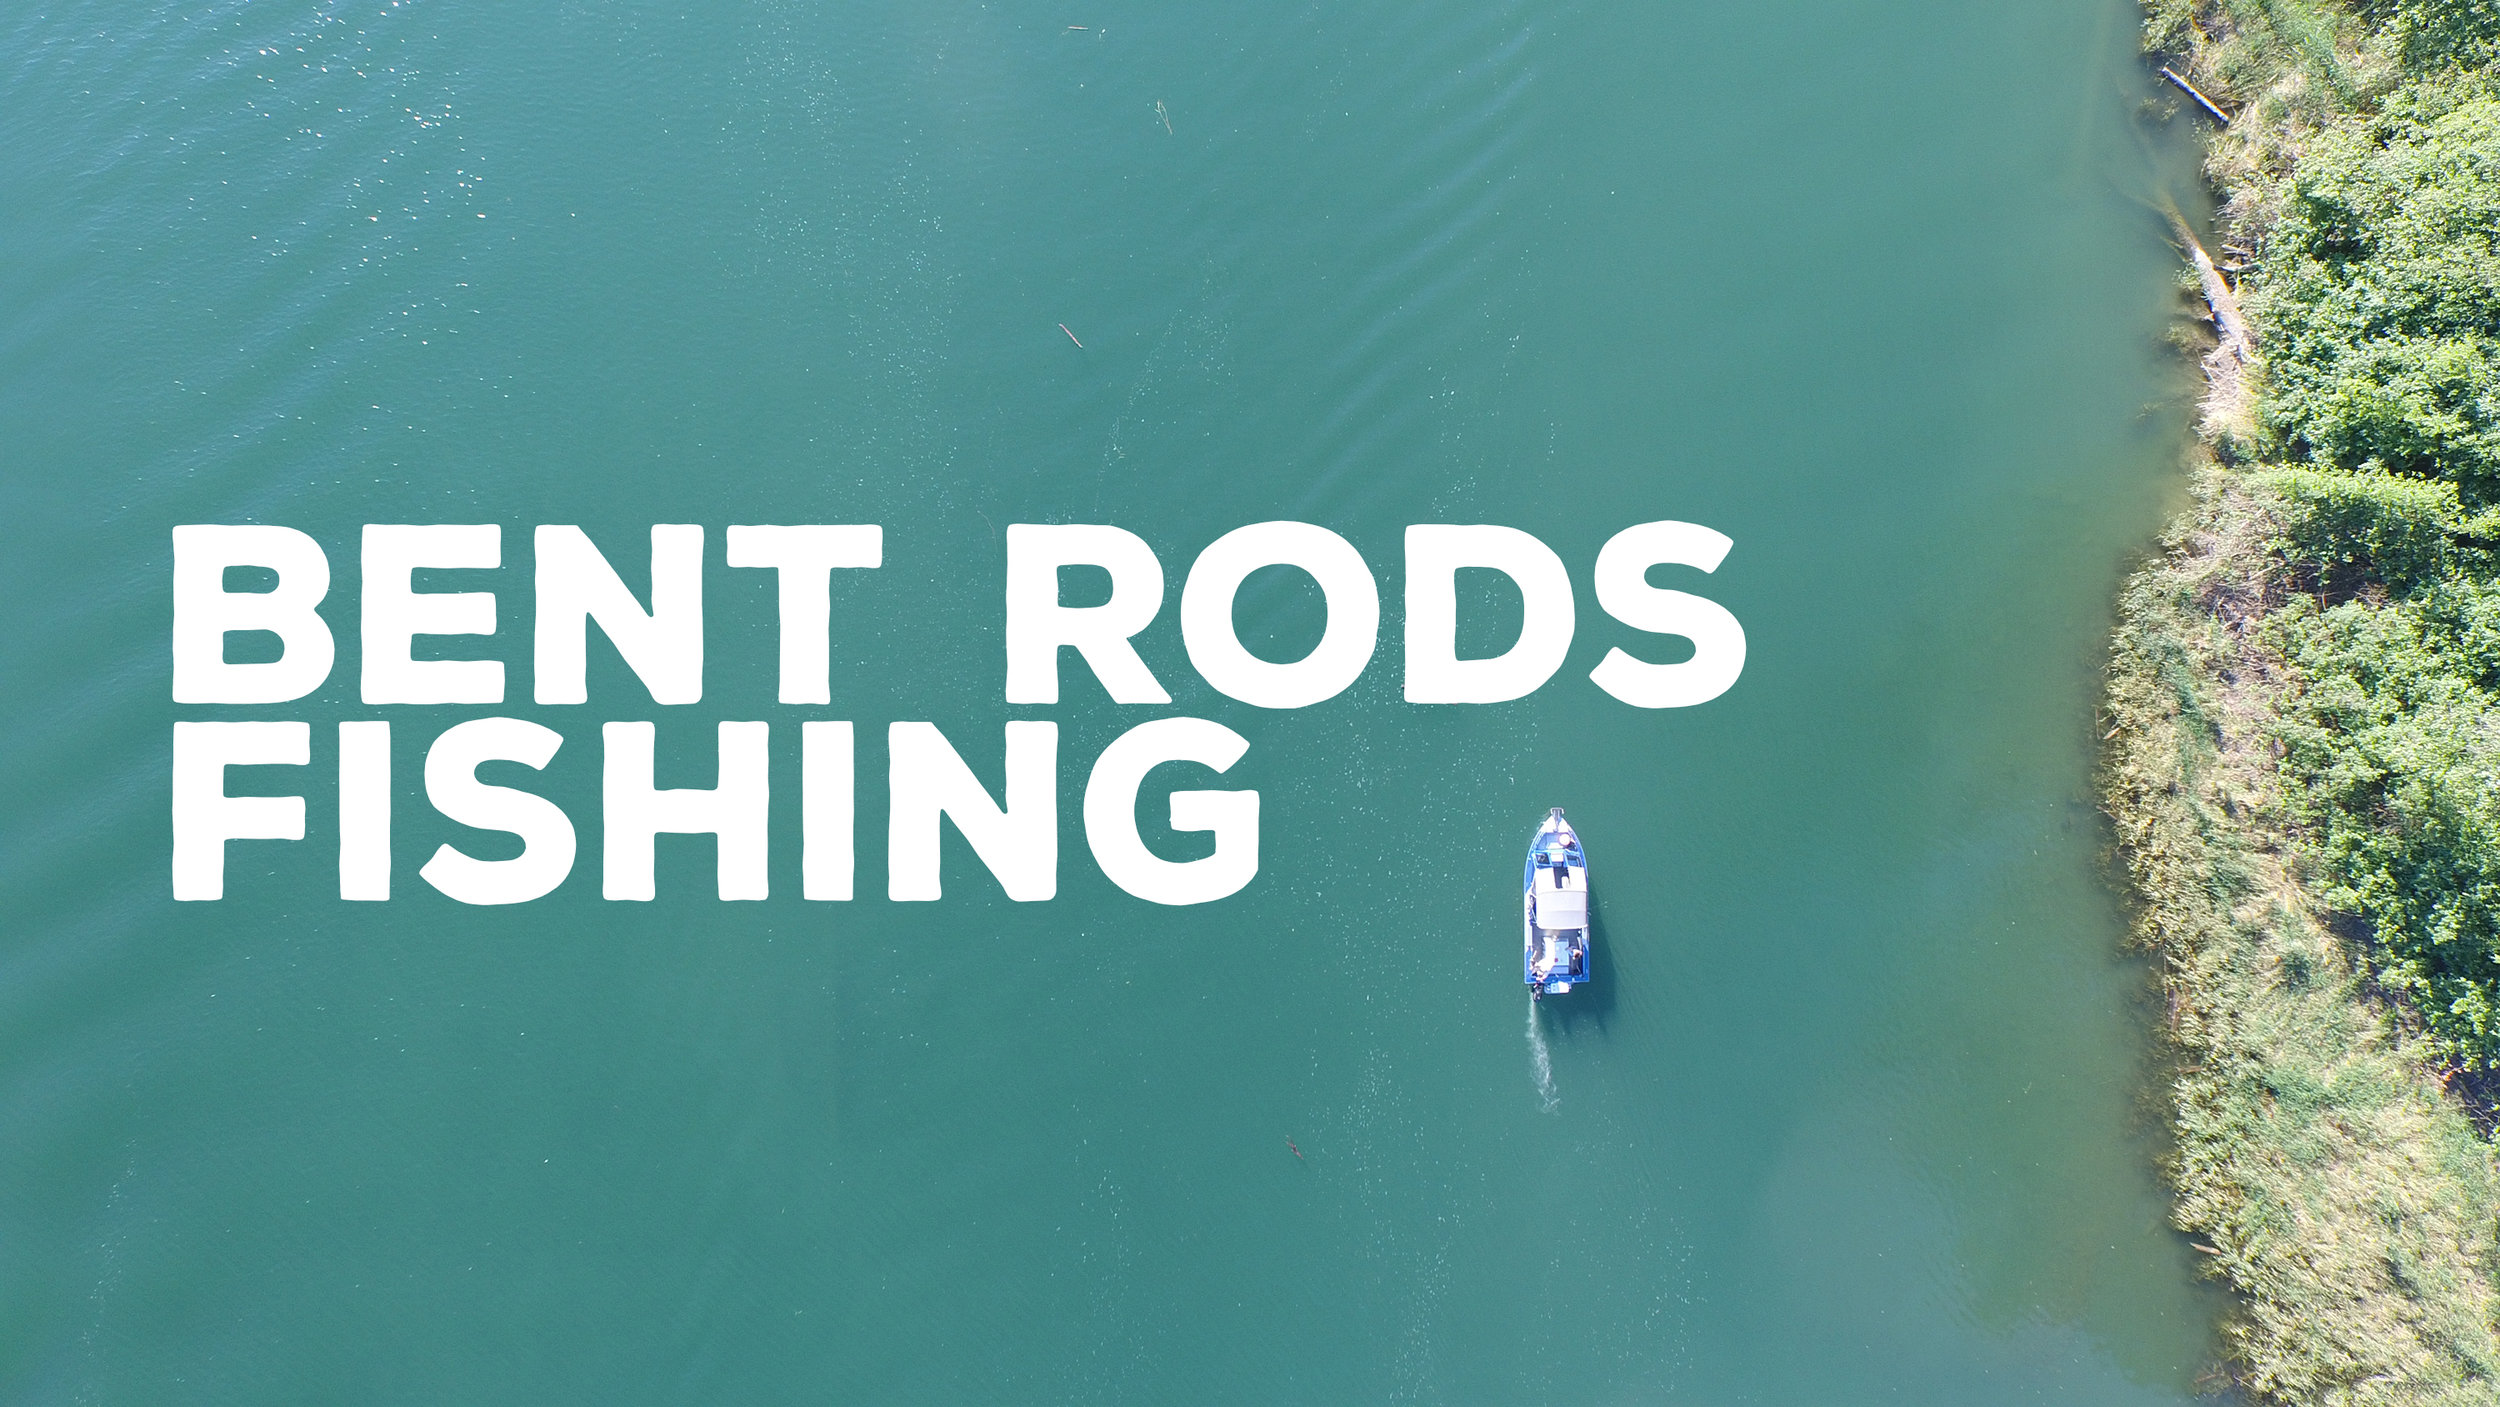 Bent-Rods-Fishing.jpg